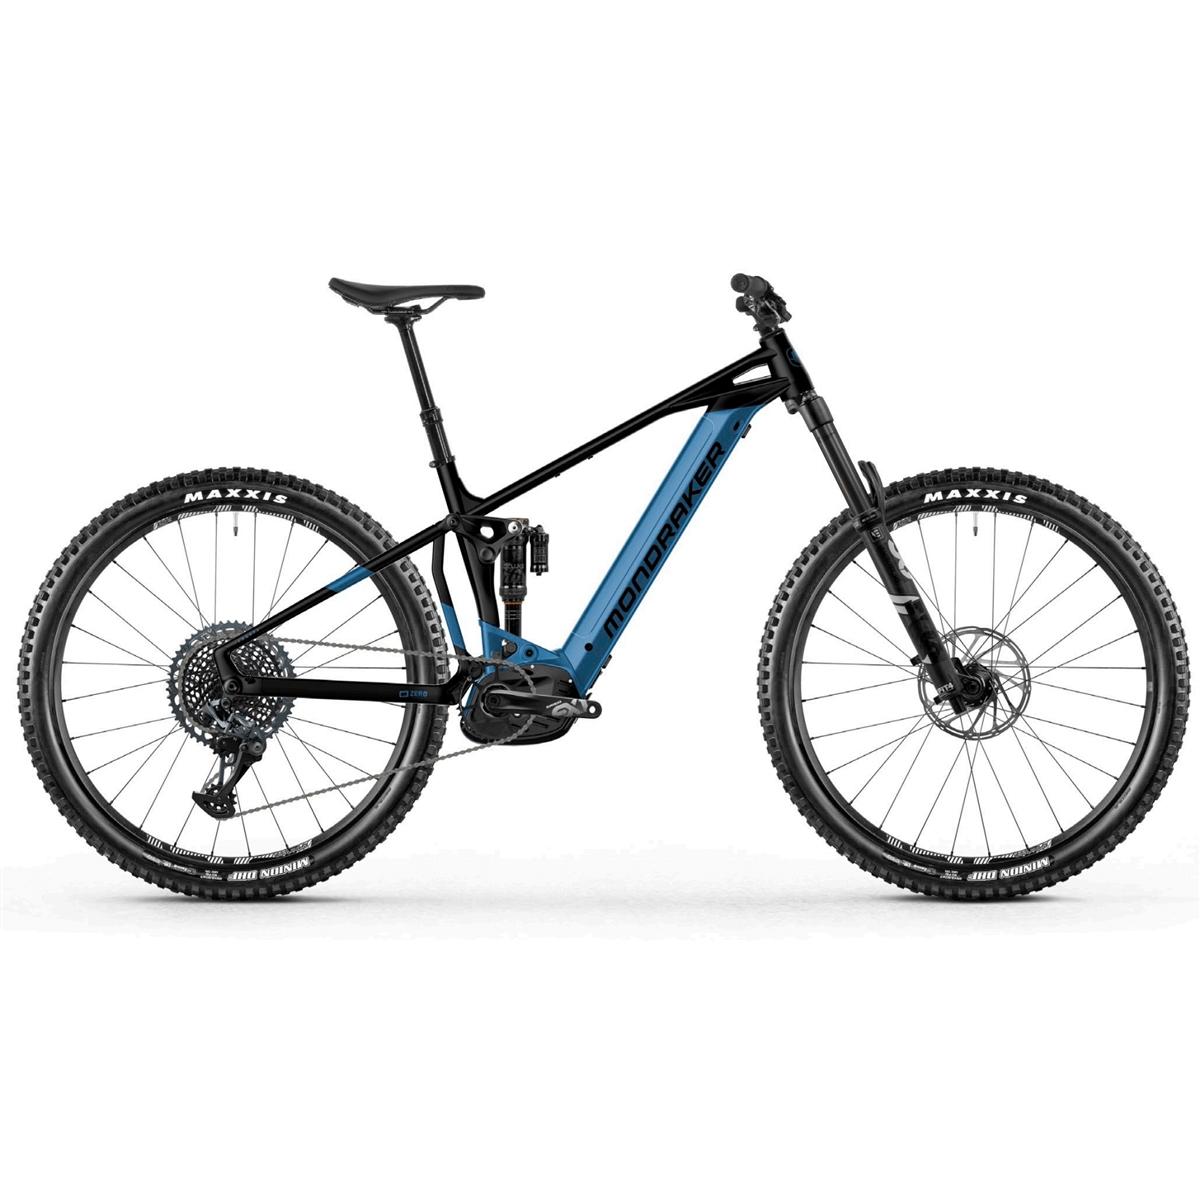 Crafty SE 29'' 160mm 12s 625Wh Bosch CX blue 2022 Size 38